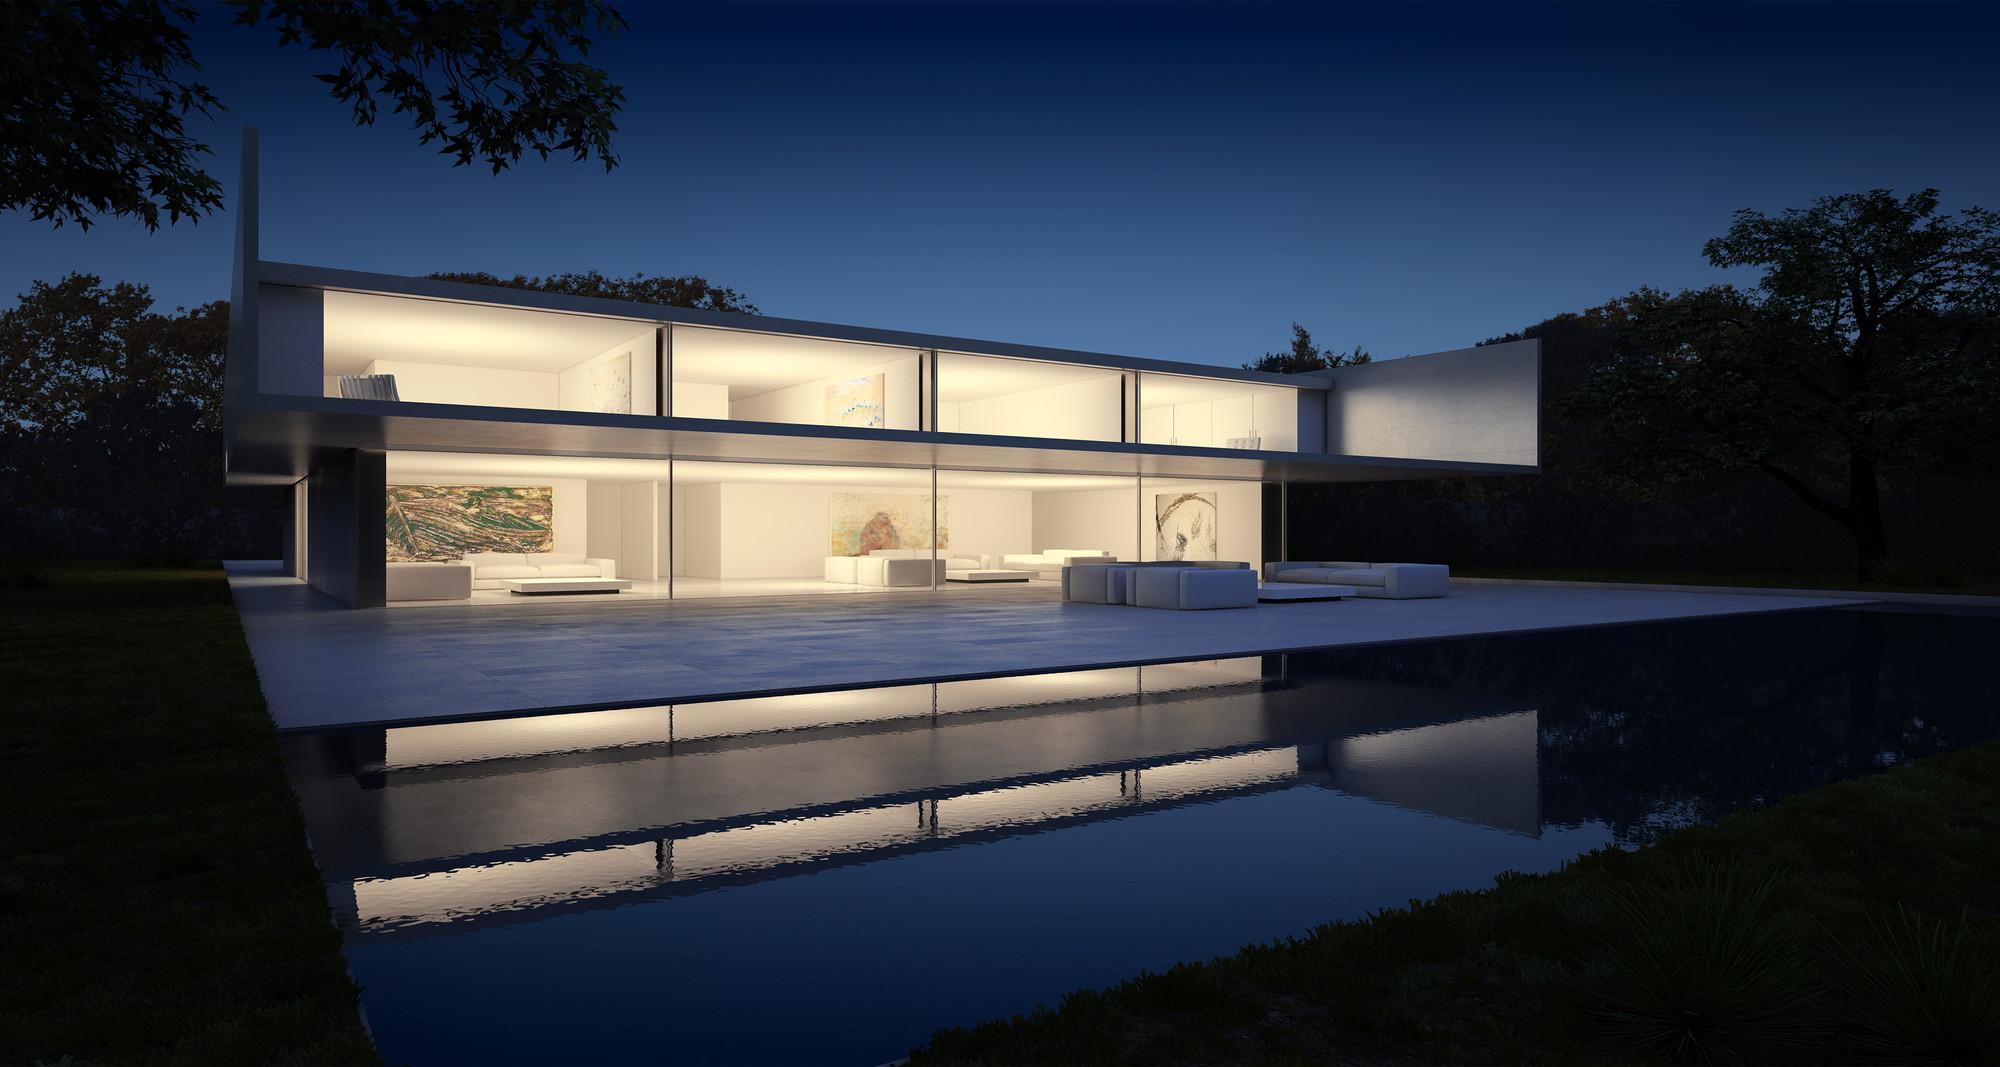 Galer a de en construcci n casa de aluminio fran - Fran silvestre arquitectos ...